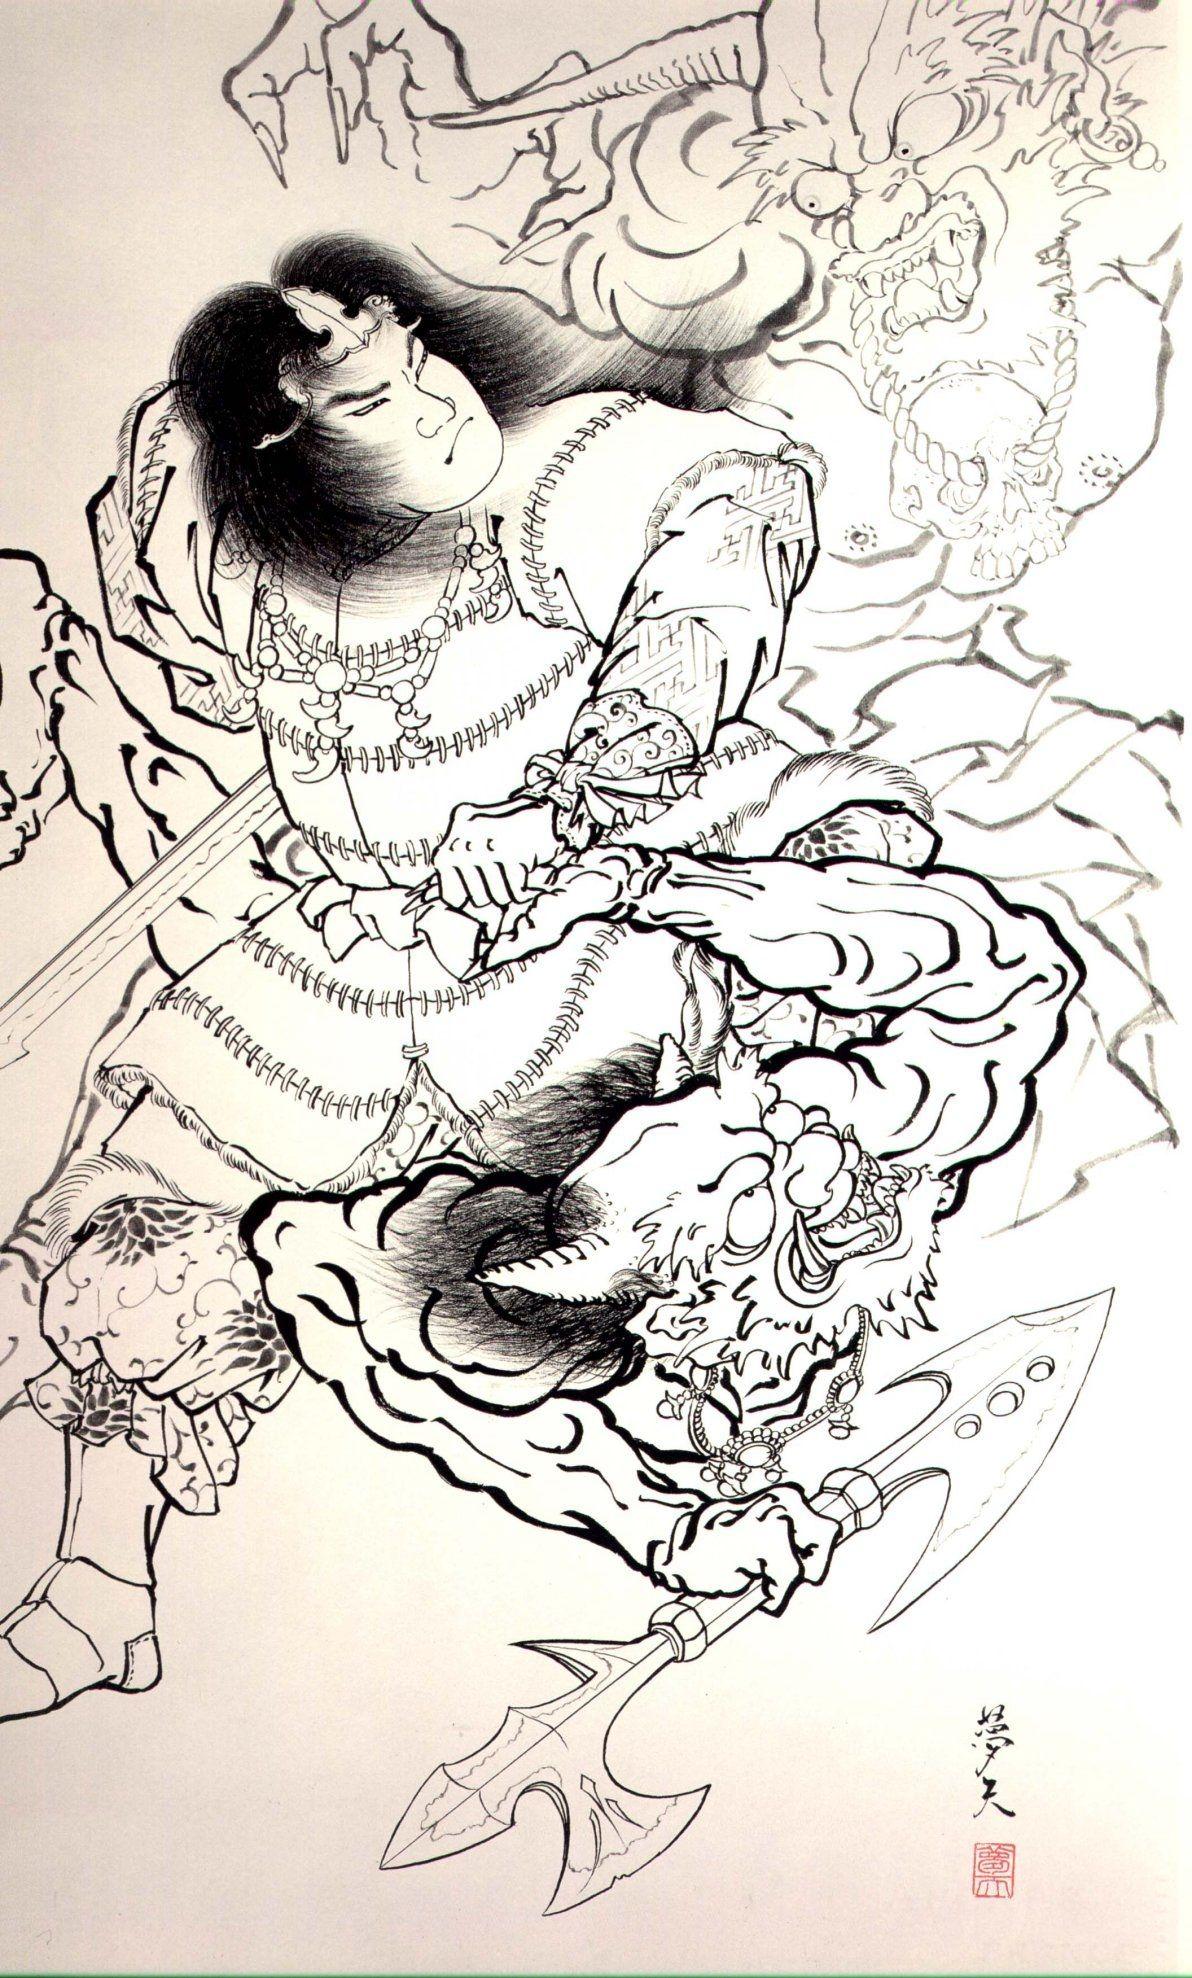 Asian Tattoos Illustrations: ปักพินโดย William Fears ใน Samurai